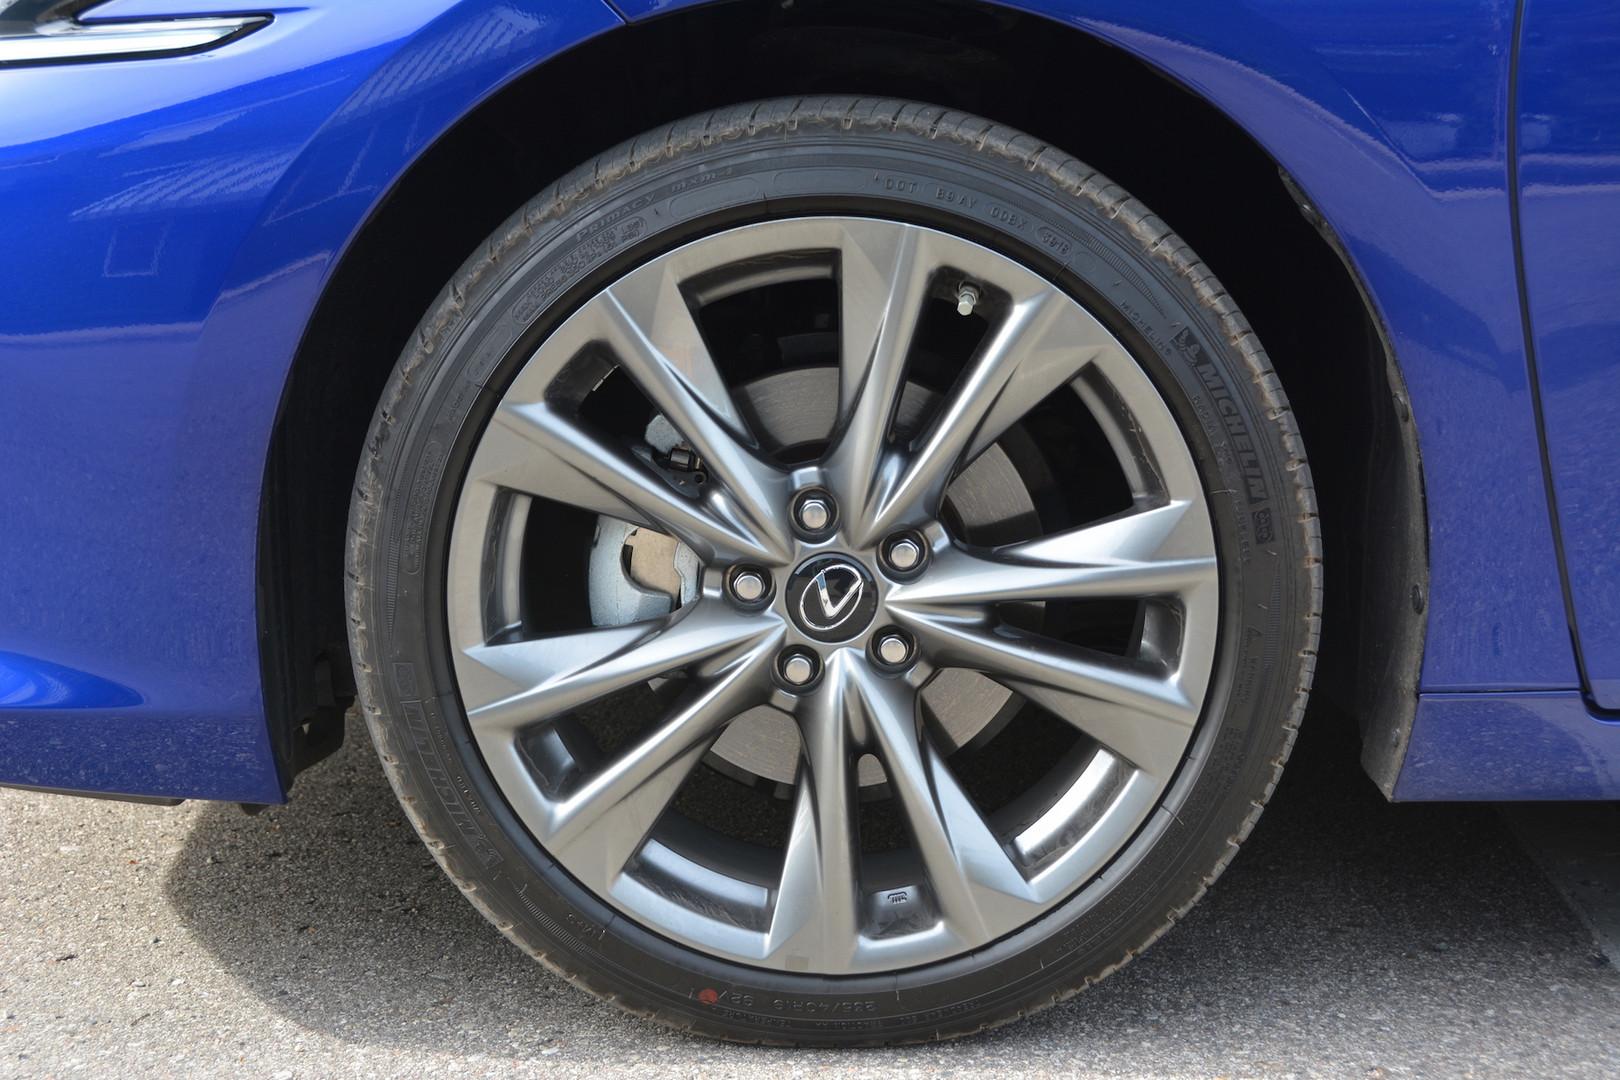 2019 Lexus ES 350 F Sport Wheels